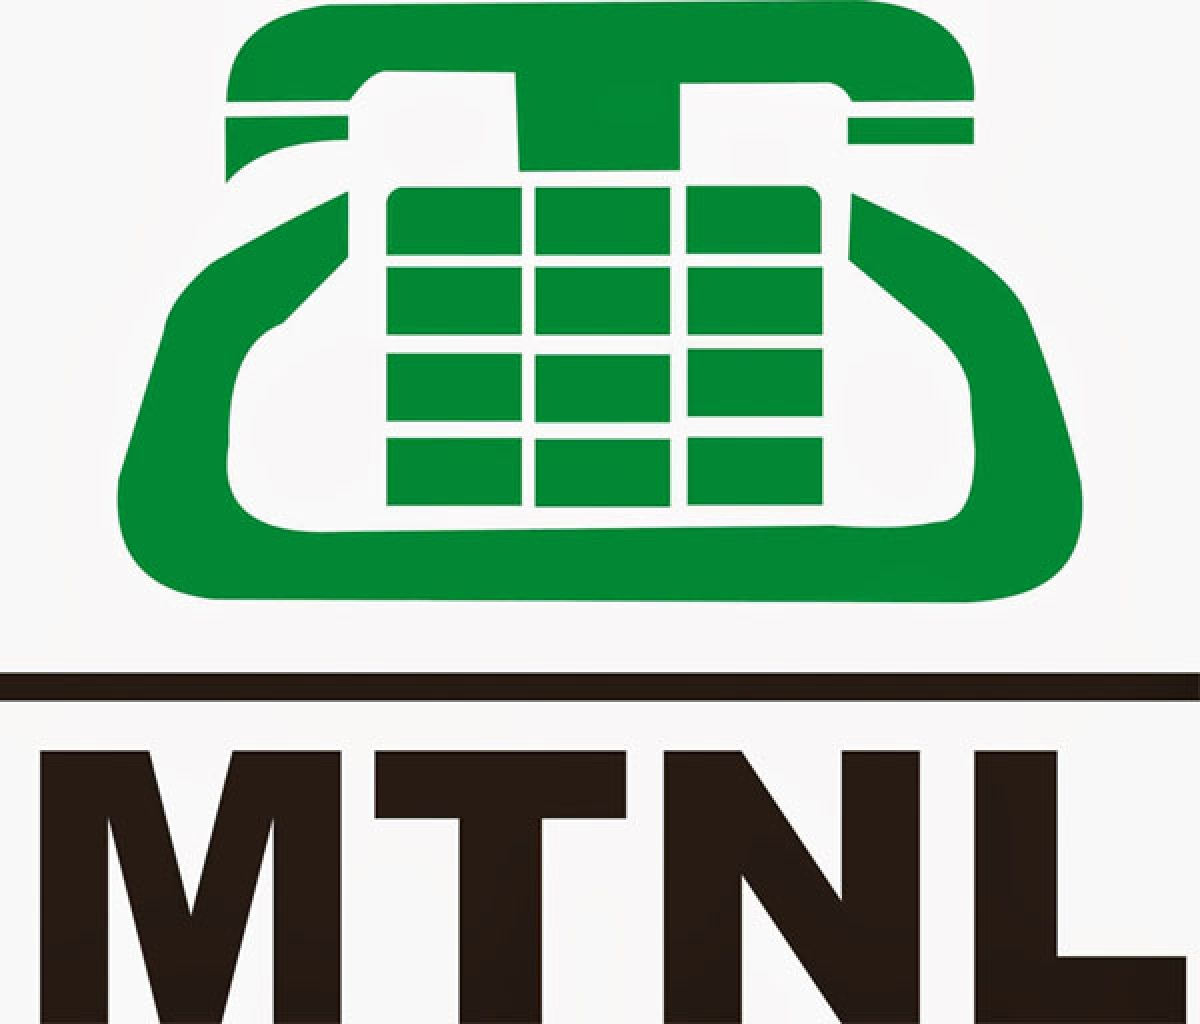 Coronavirus in Mumbai: MTNL customers complain of poor service, WFH affected